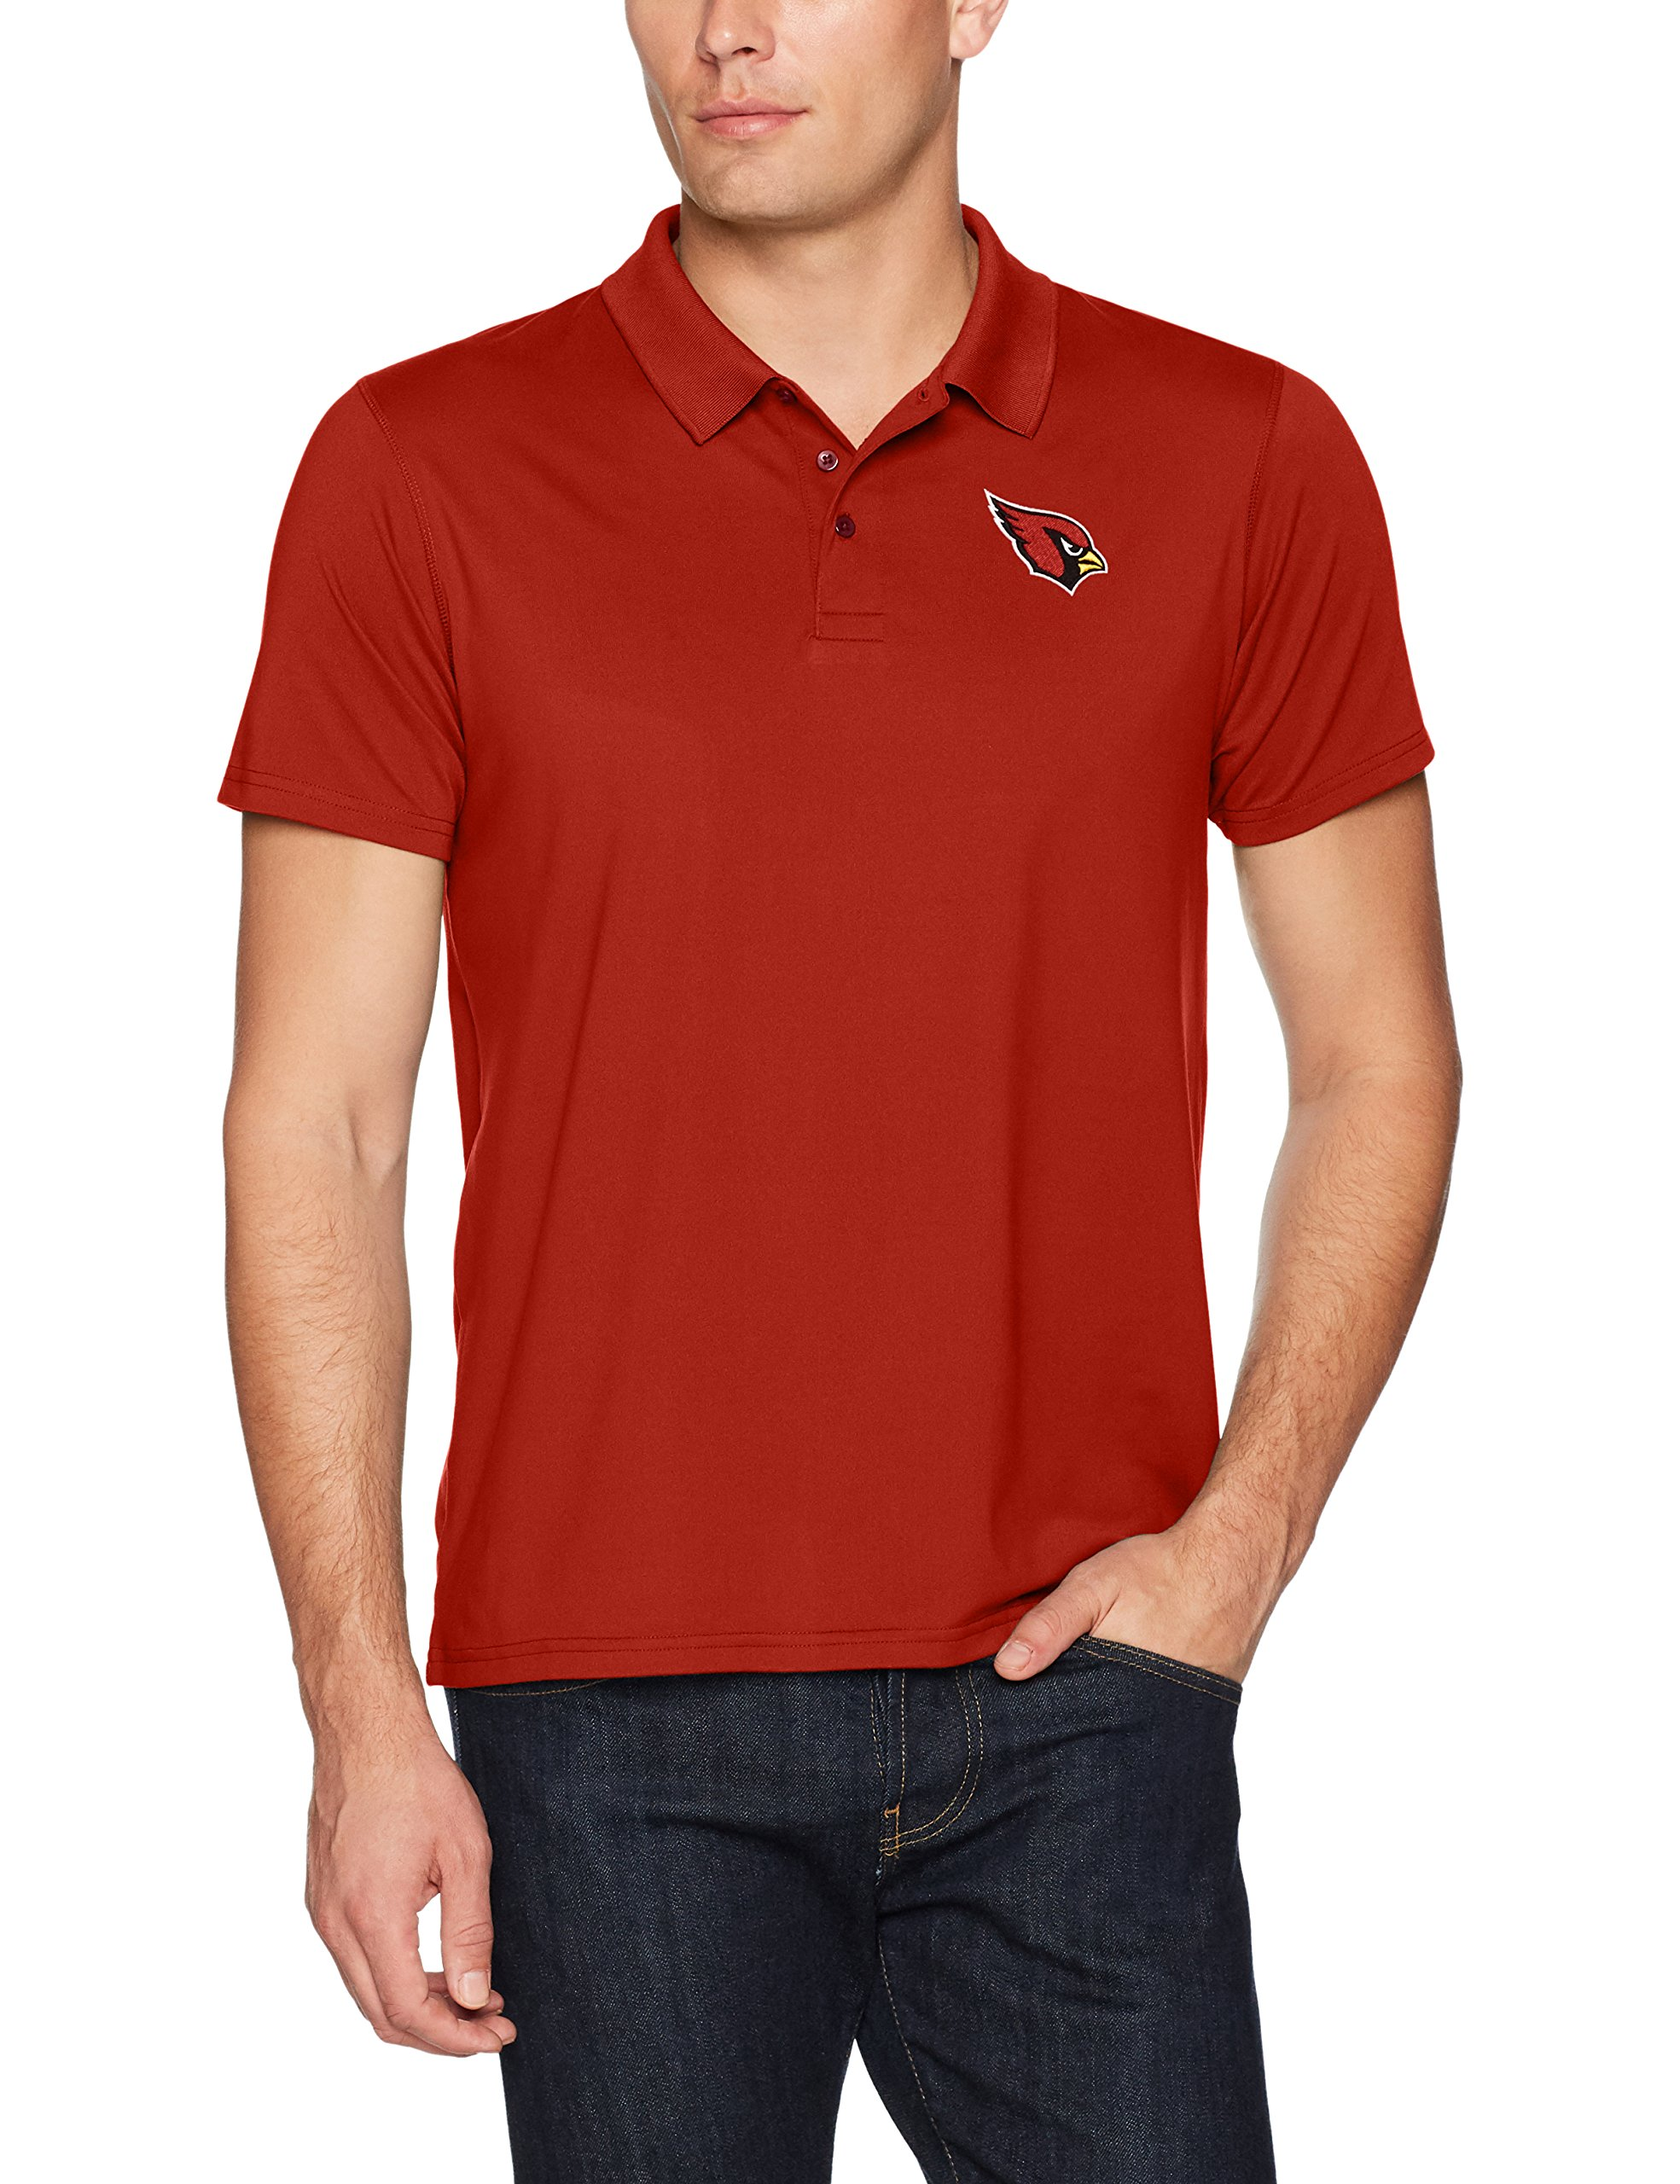 NFL Arizona Cardinals Men's Sueded Short Sleeve Polo Shirt, Logo, Small